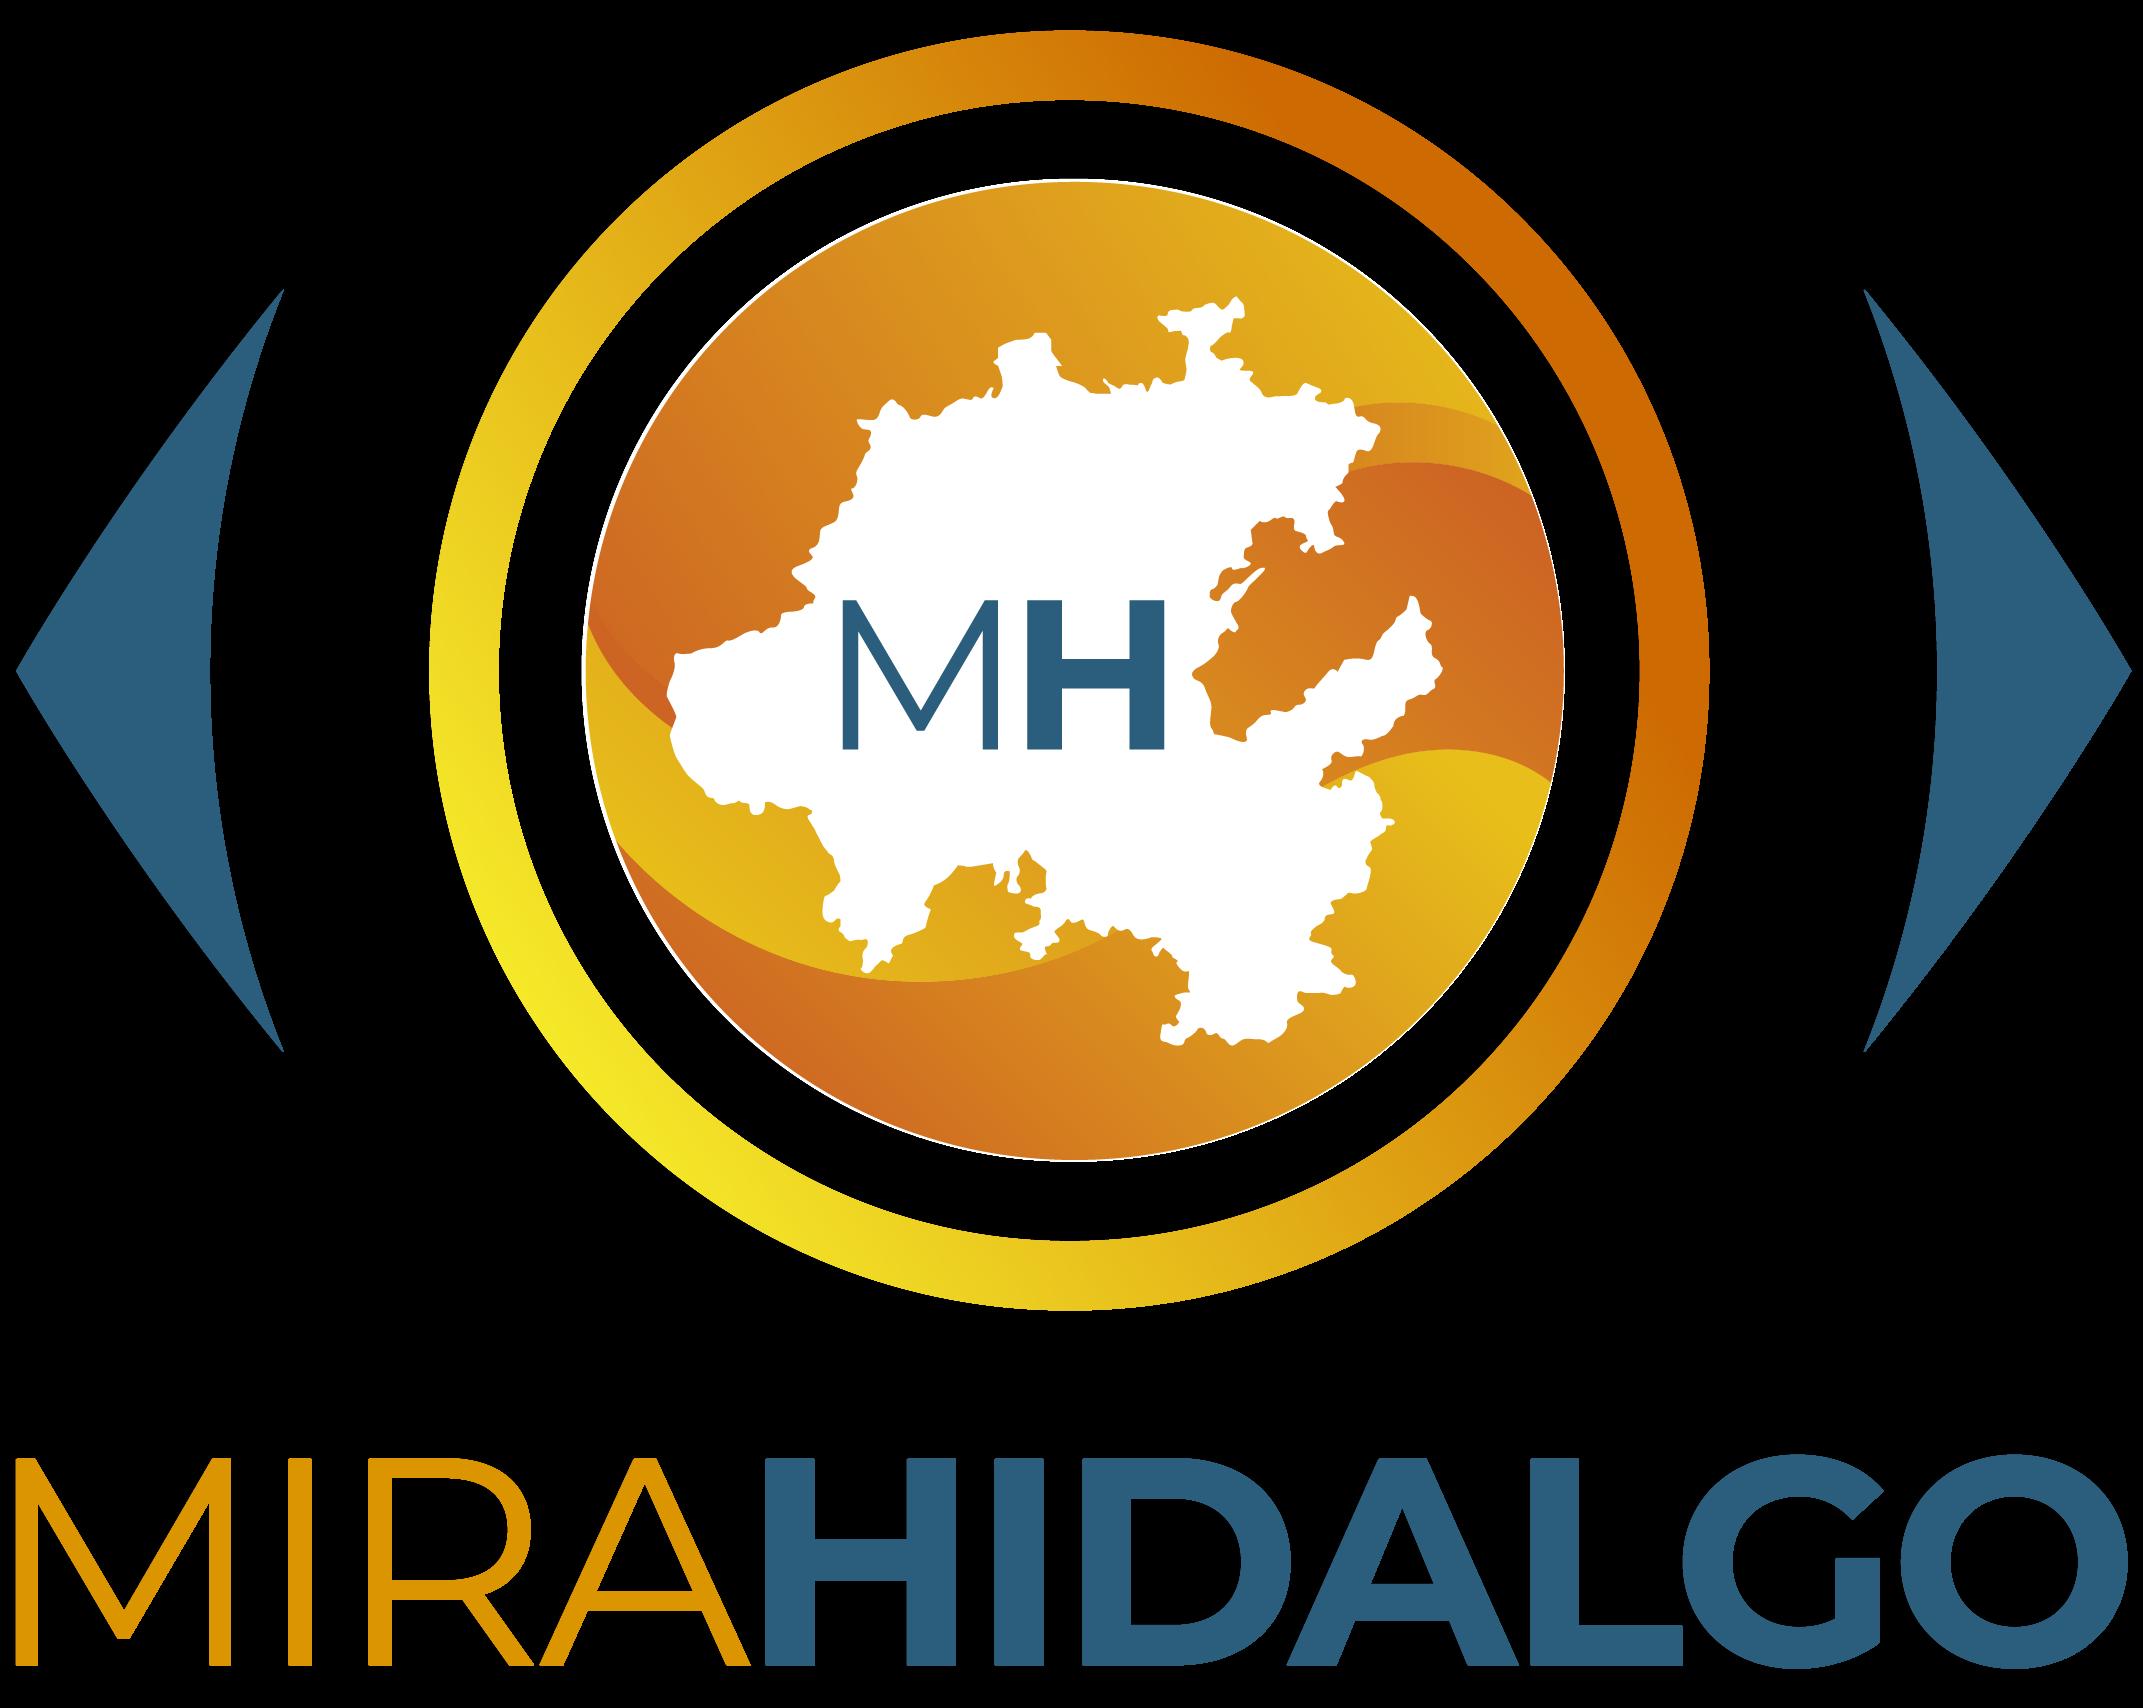 Mira Hidalgo